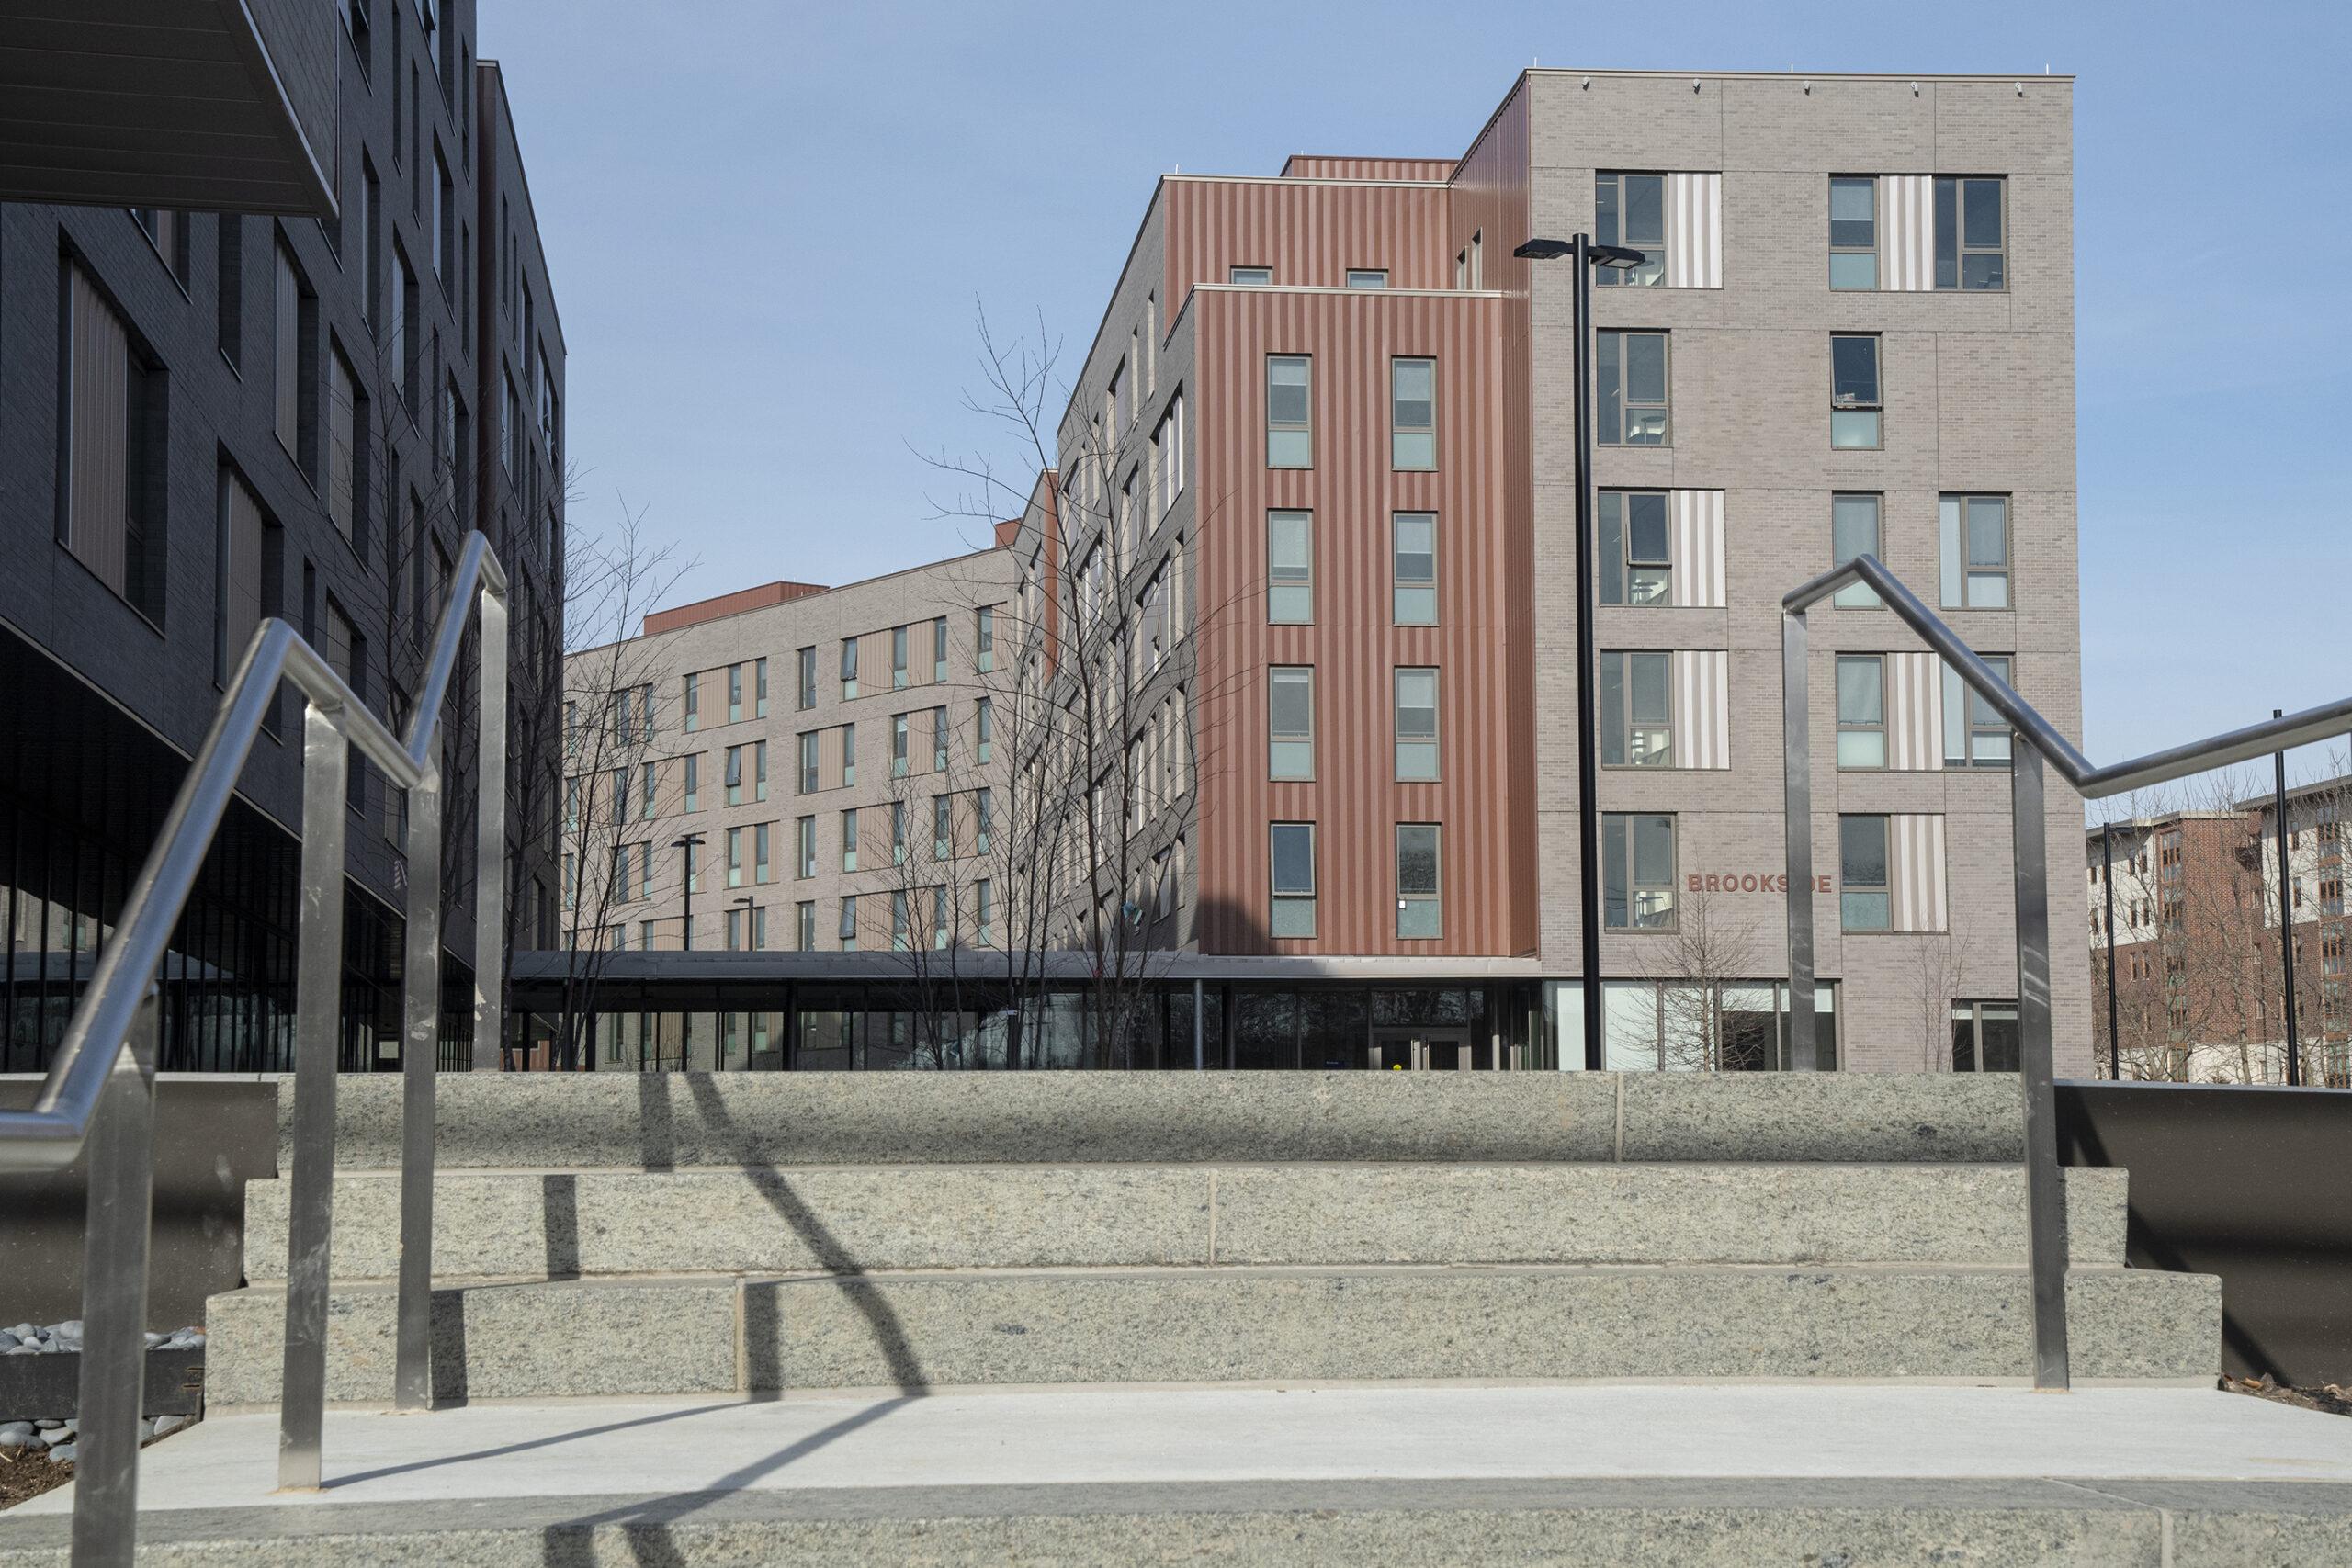 Uri To Reduce On Campus Living25%, Modify Fall Academic Within University Of Rhode Island Calendar